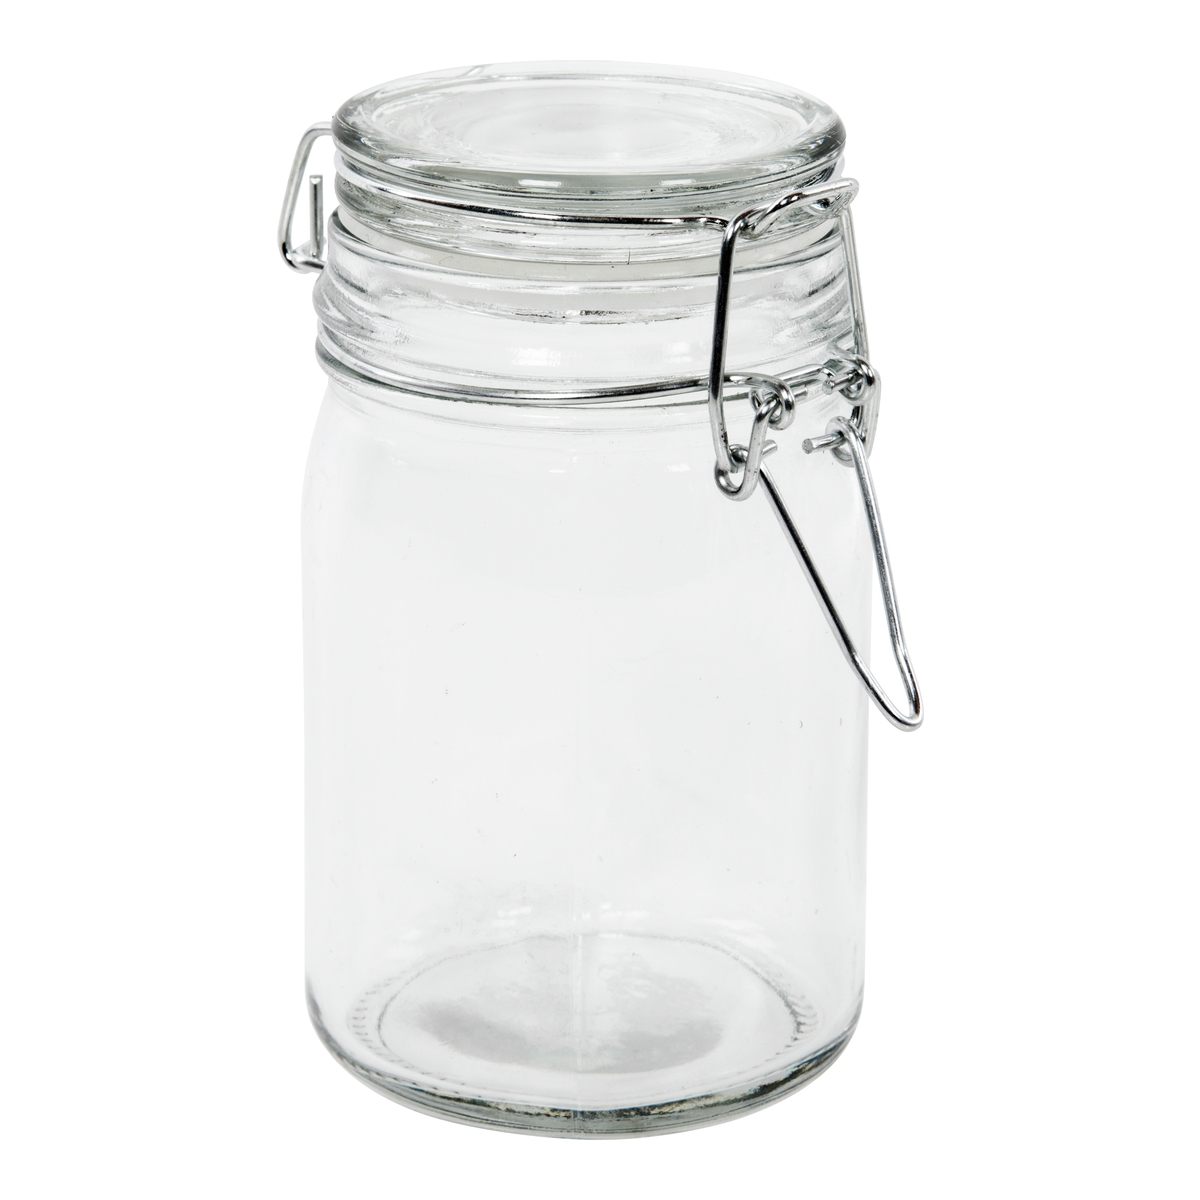 Glasskrukke m/lokk 0,25l-KRU1003